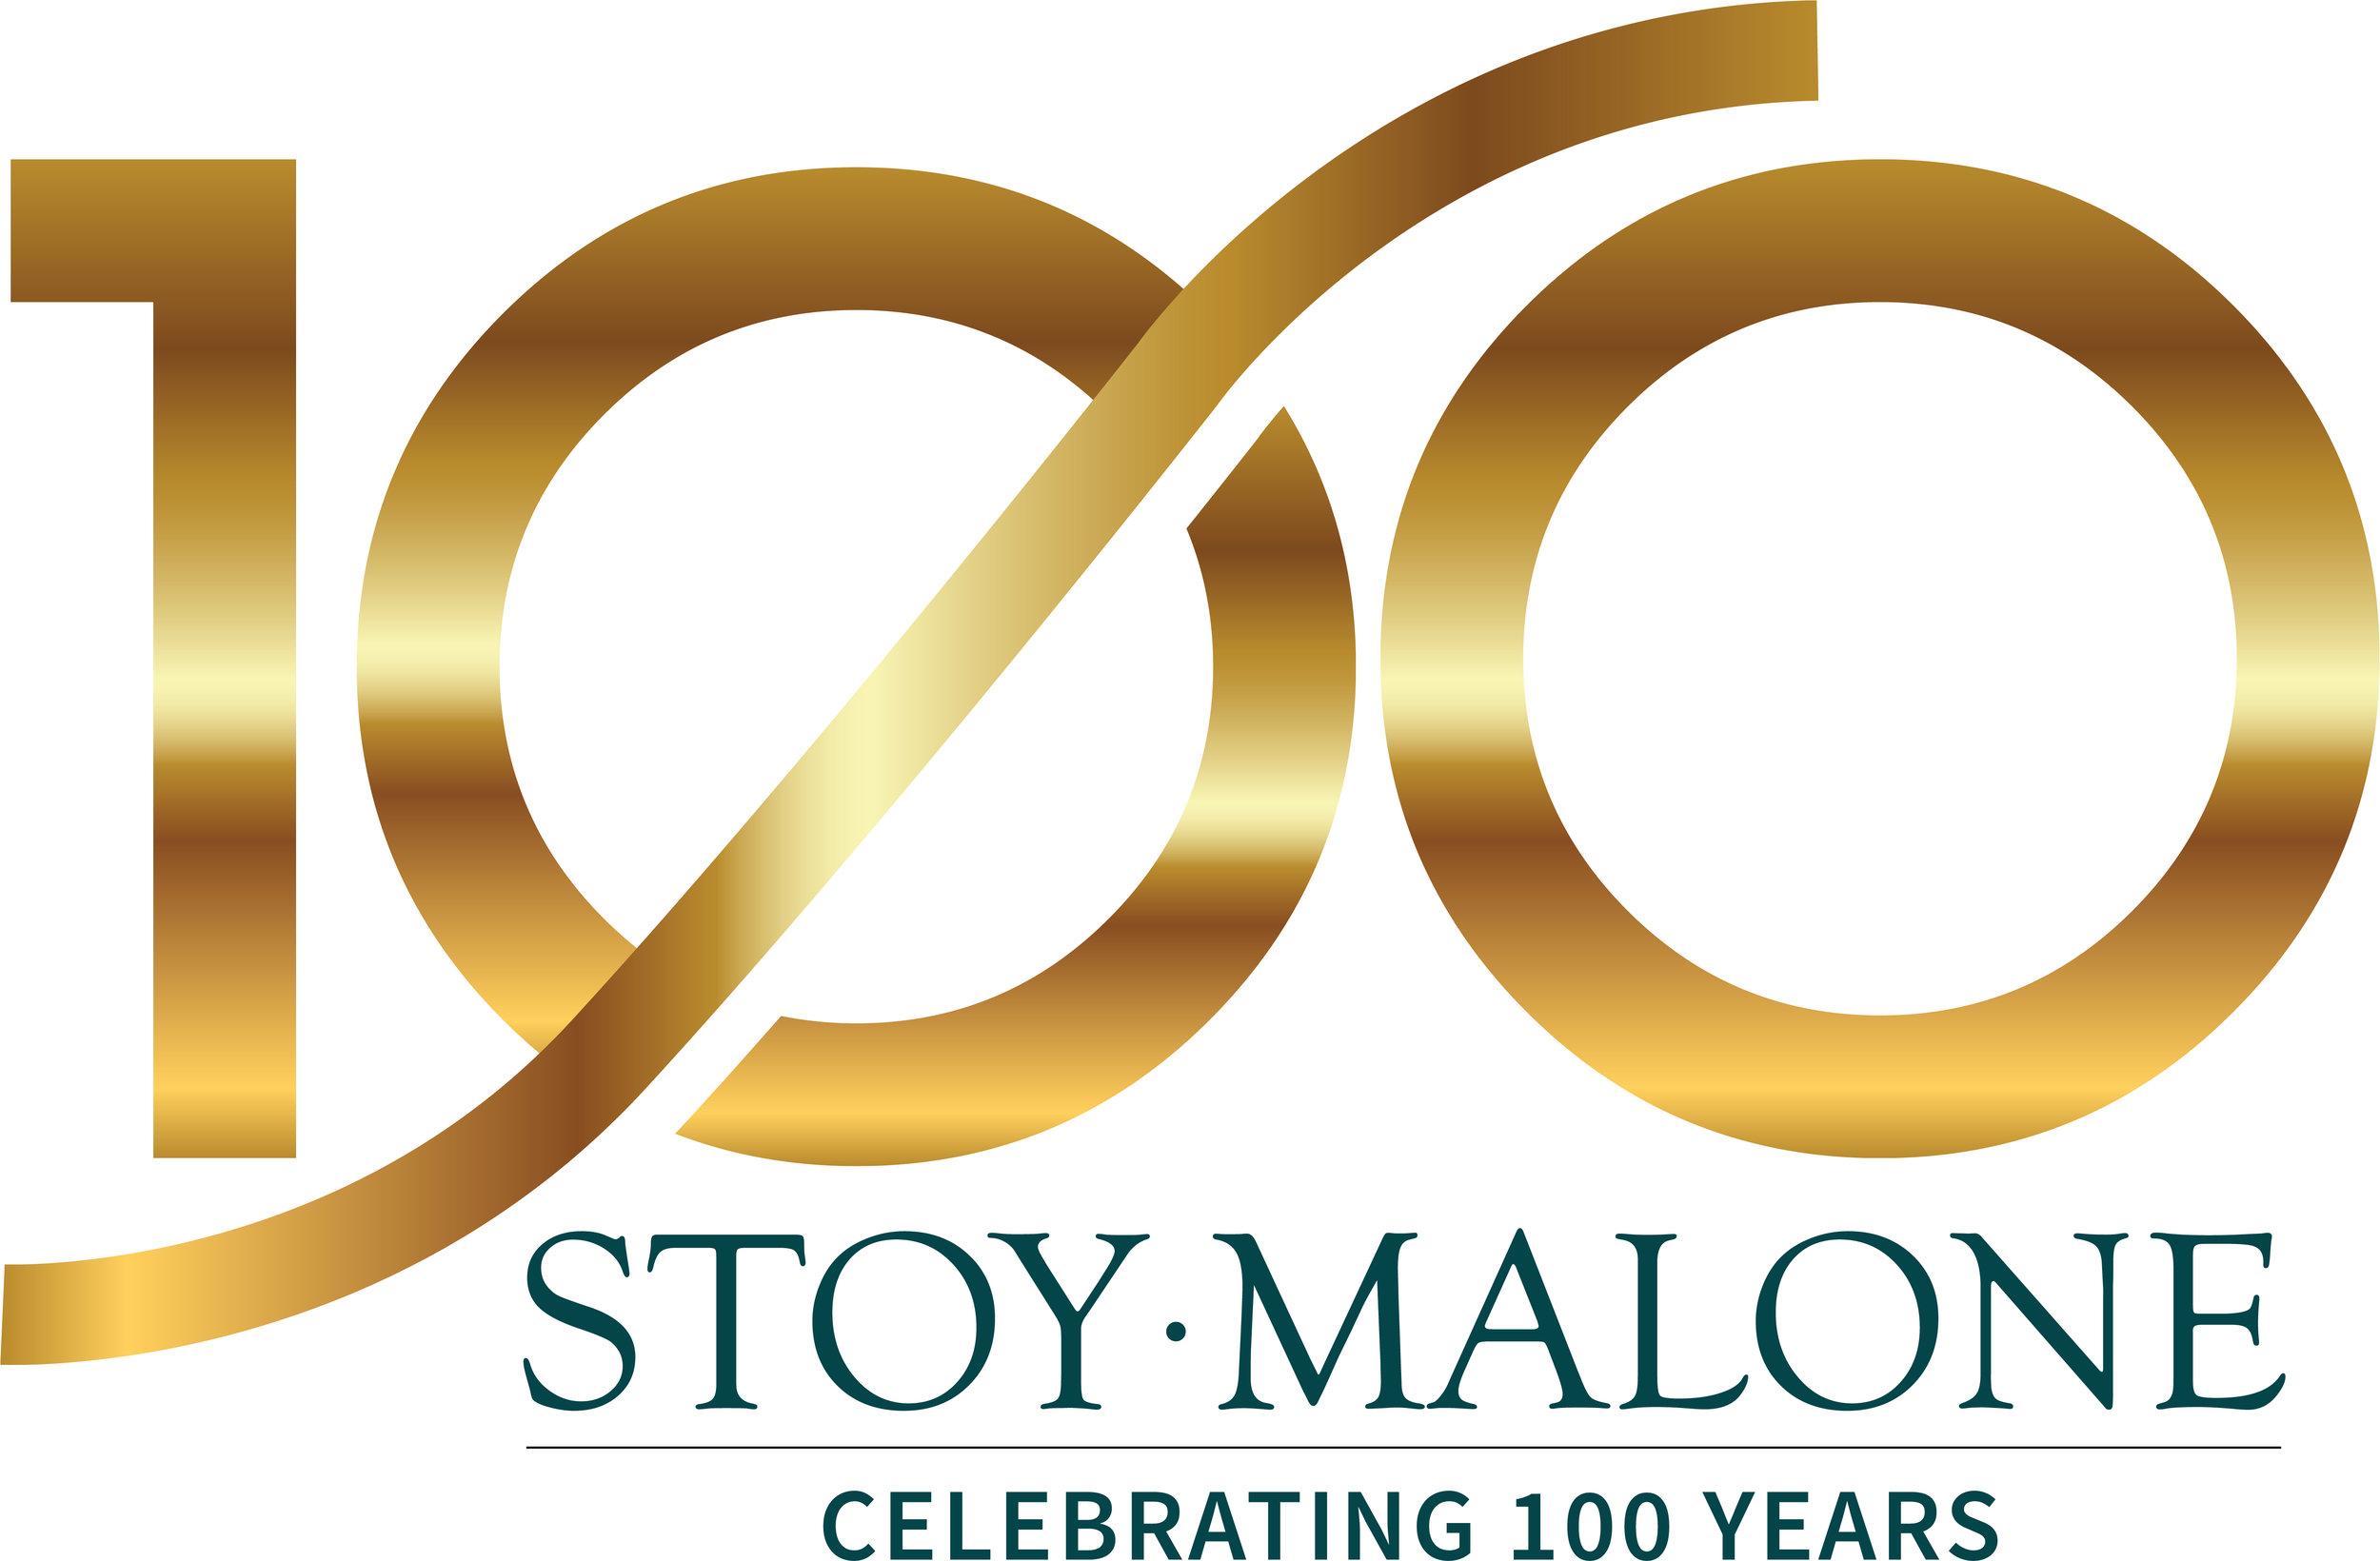 Stoy Logo sssFinal - jpg.jpg